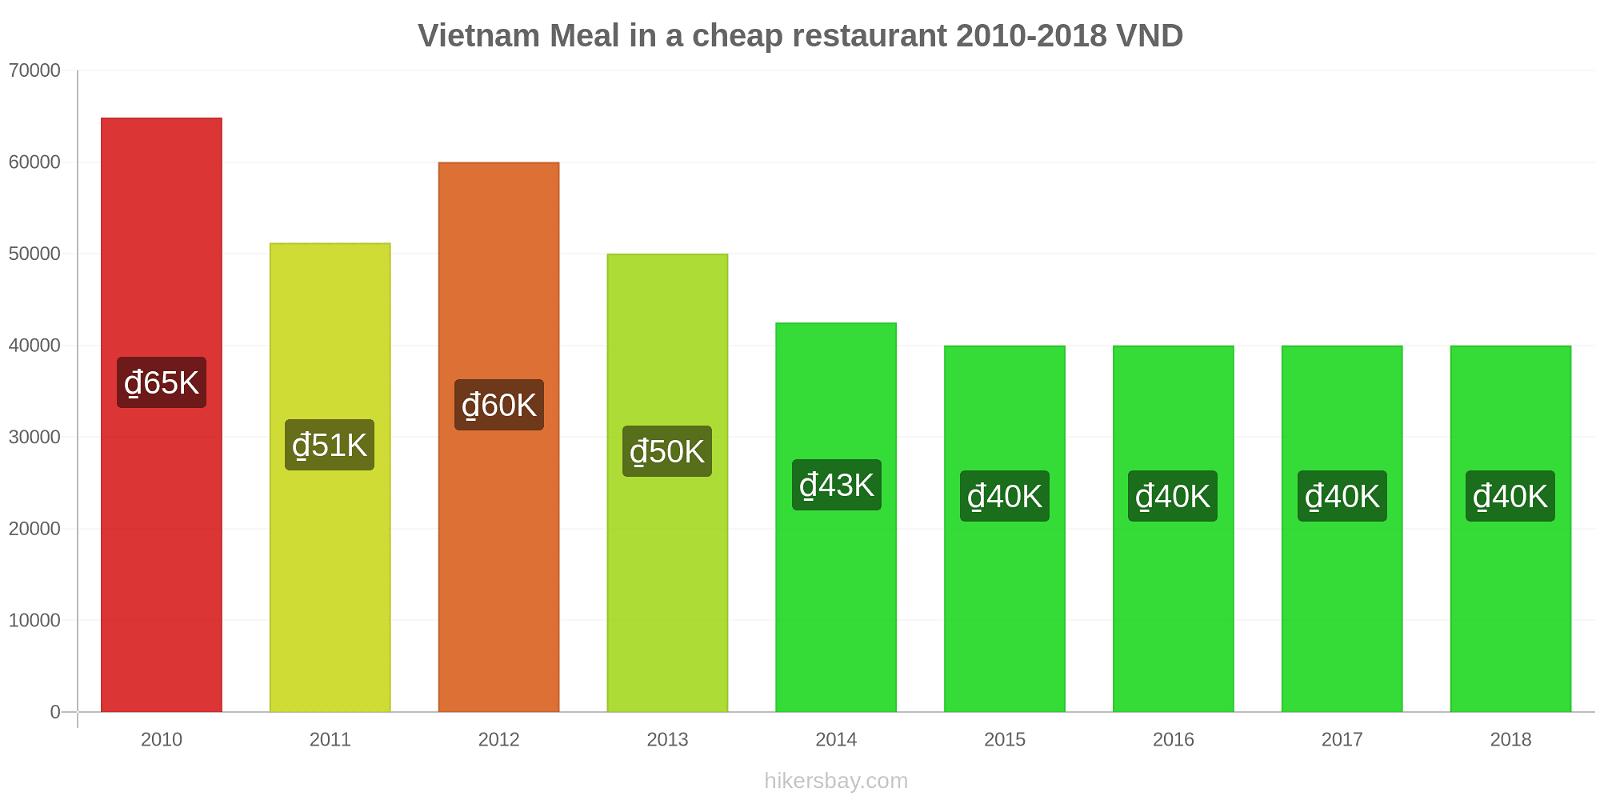 Vietnam price changes Meal in a cheap restaurant hikersbay.com